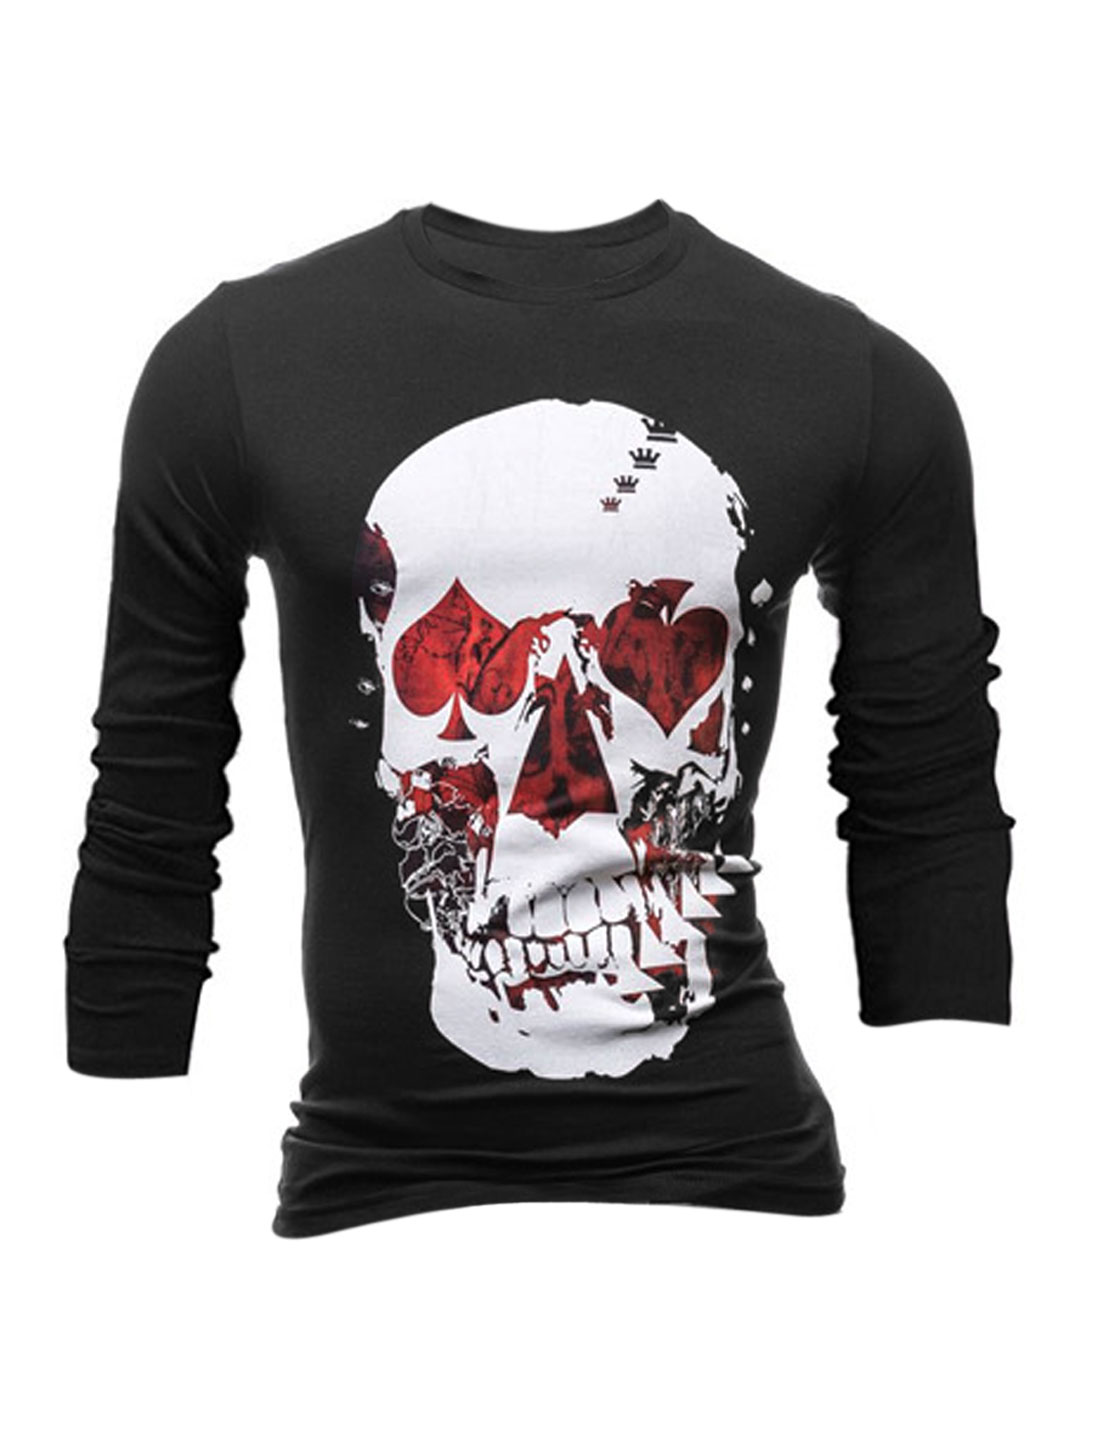 Men Poker Skull Pattern Round Neck Long Sleeves Casual T-shirt Black M